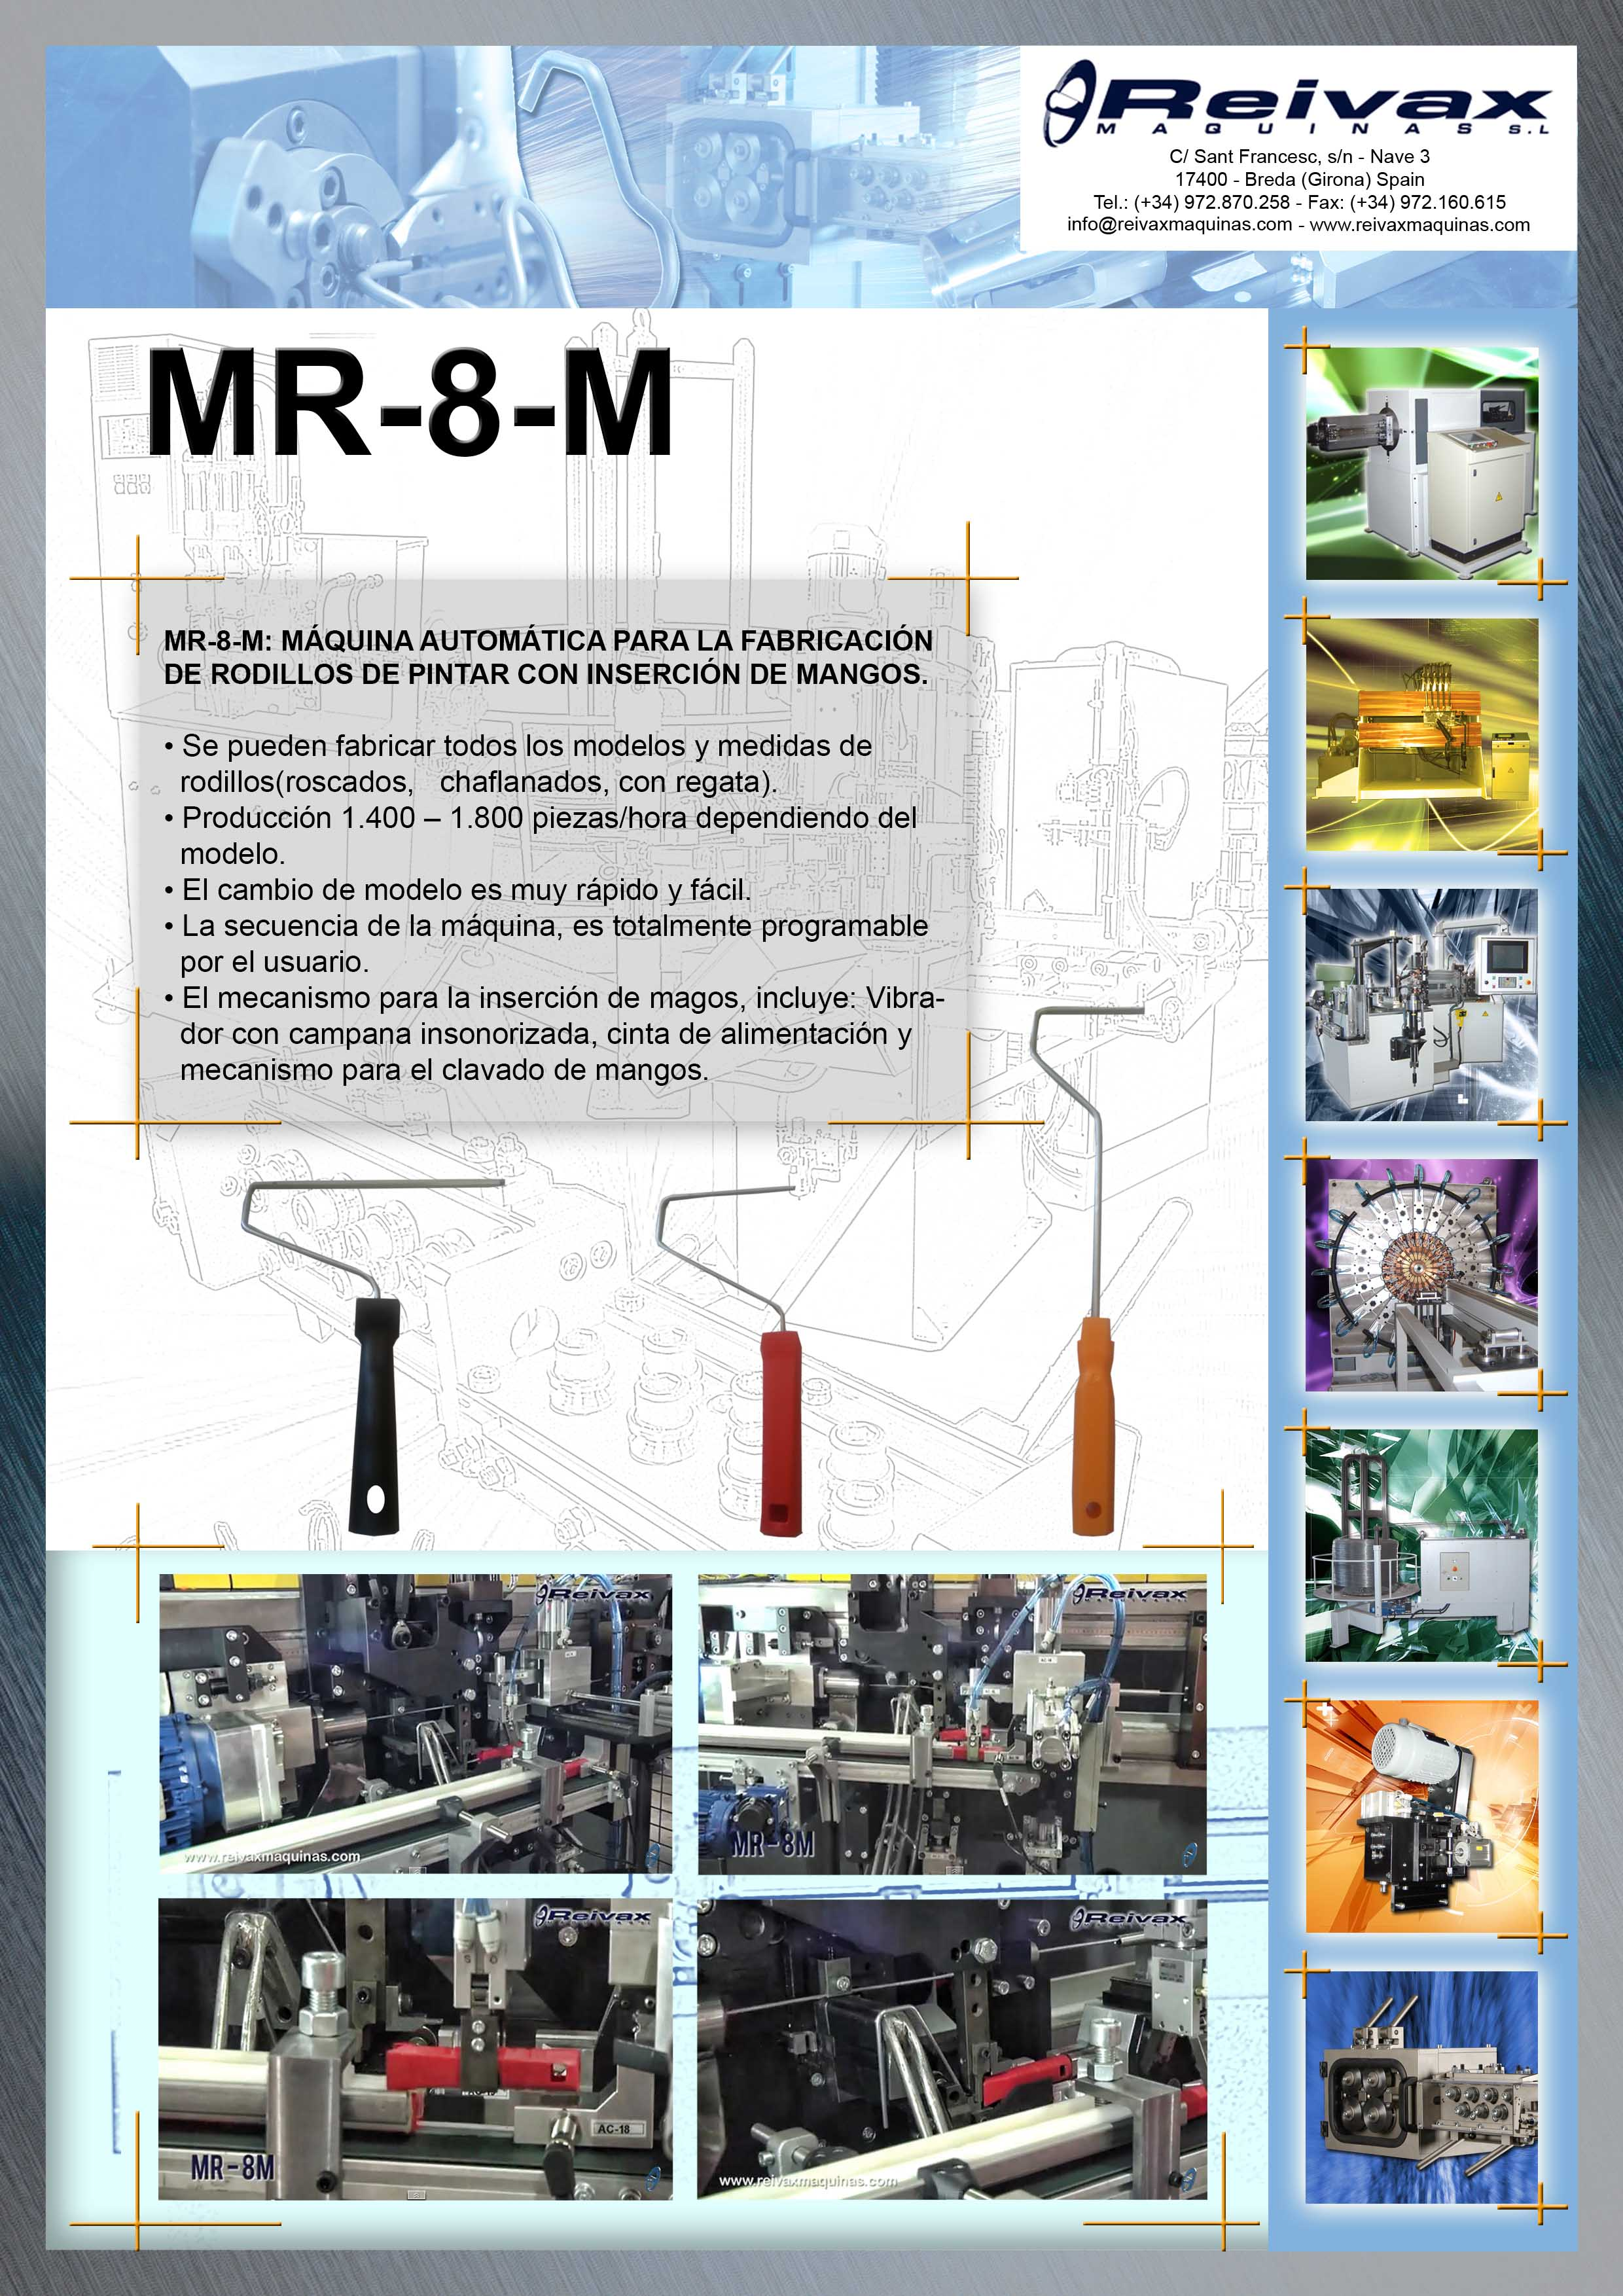 ReivaxMaquinas: Ficha Tecnica MR-8-M